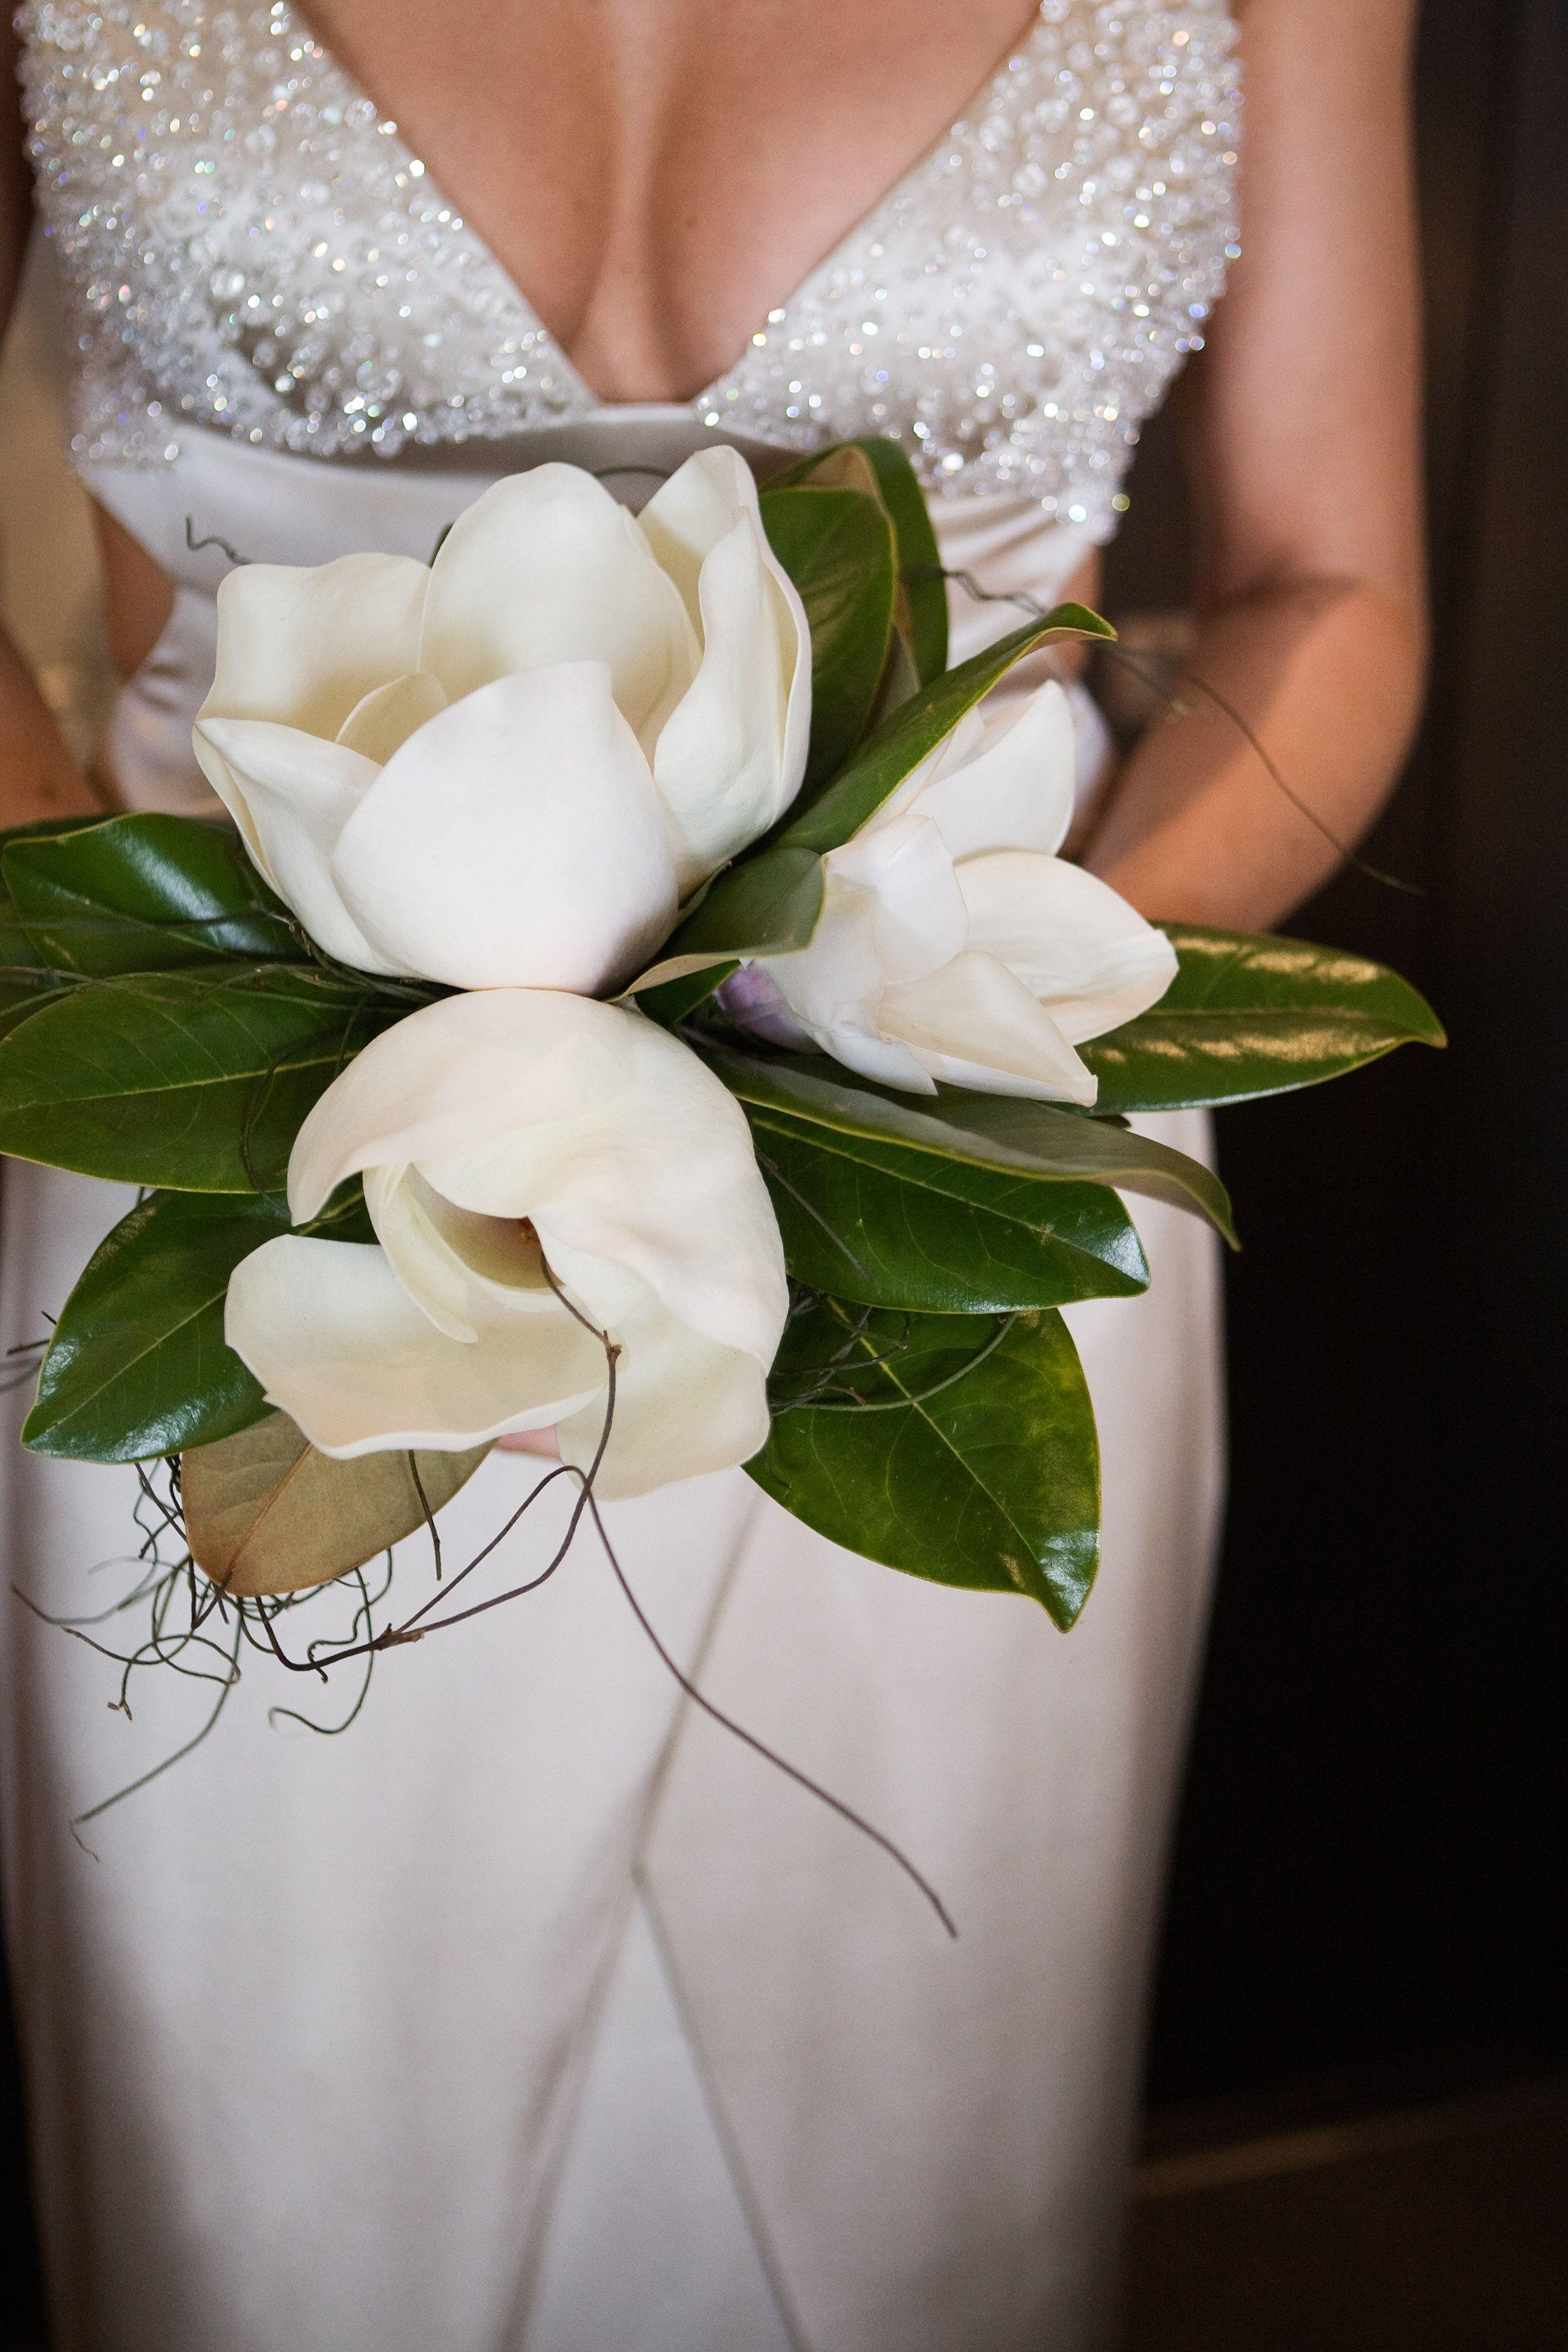 Pinterest Bouquet Sposa.Magnolia Leaf Bouquet Indie Wedding Style Pinterest Wedding